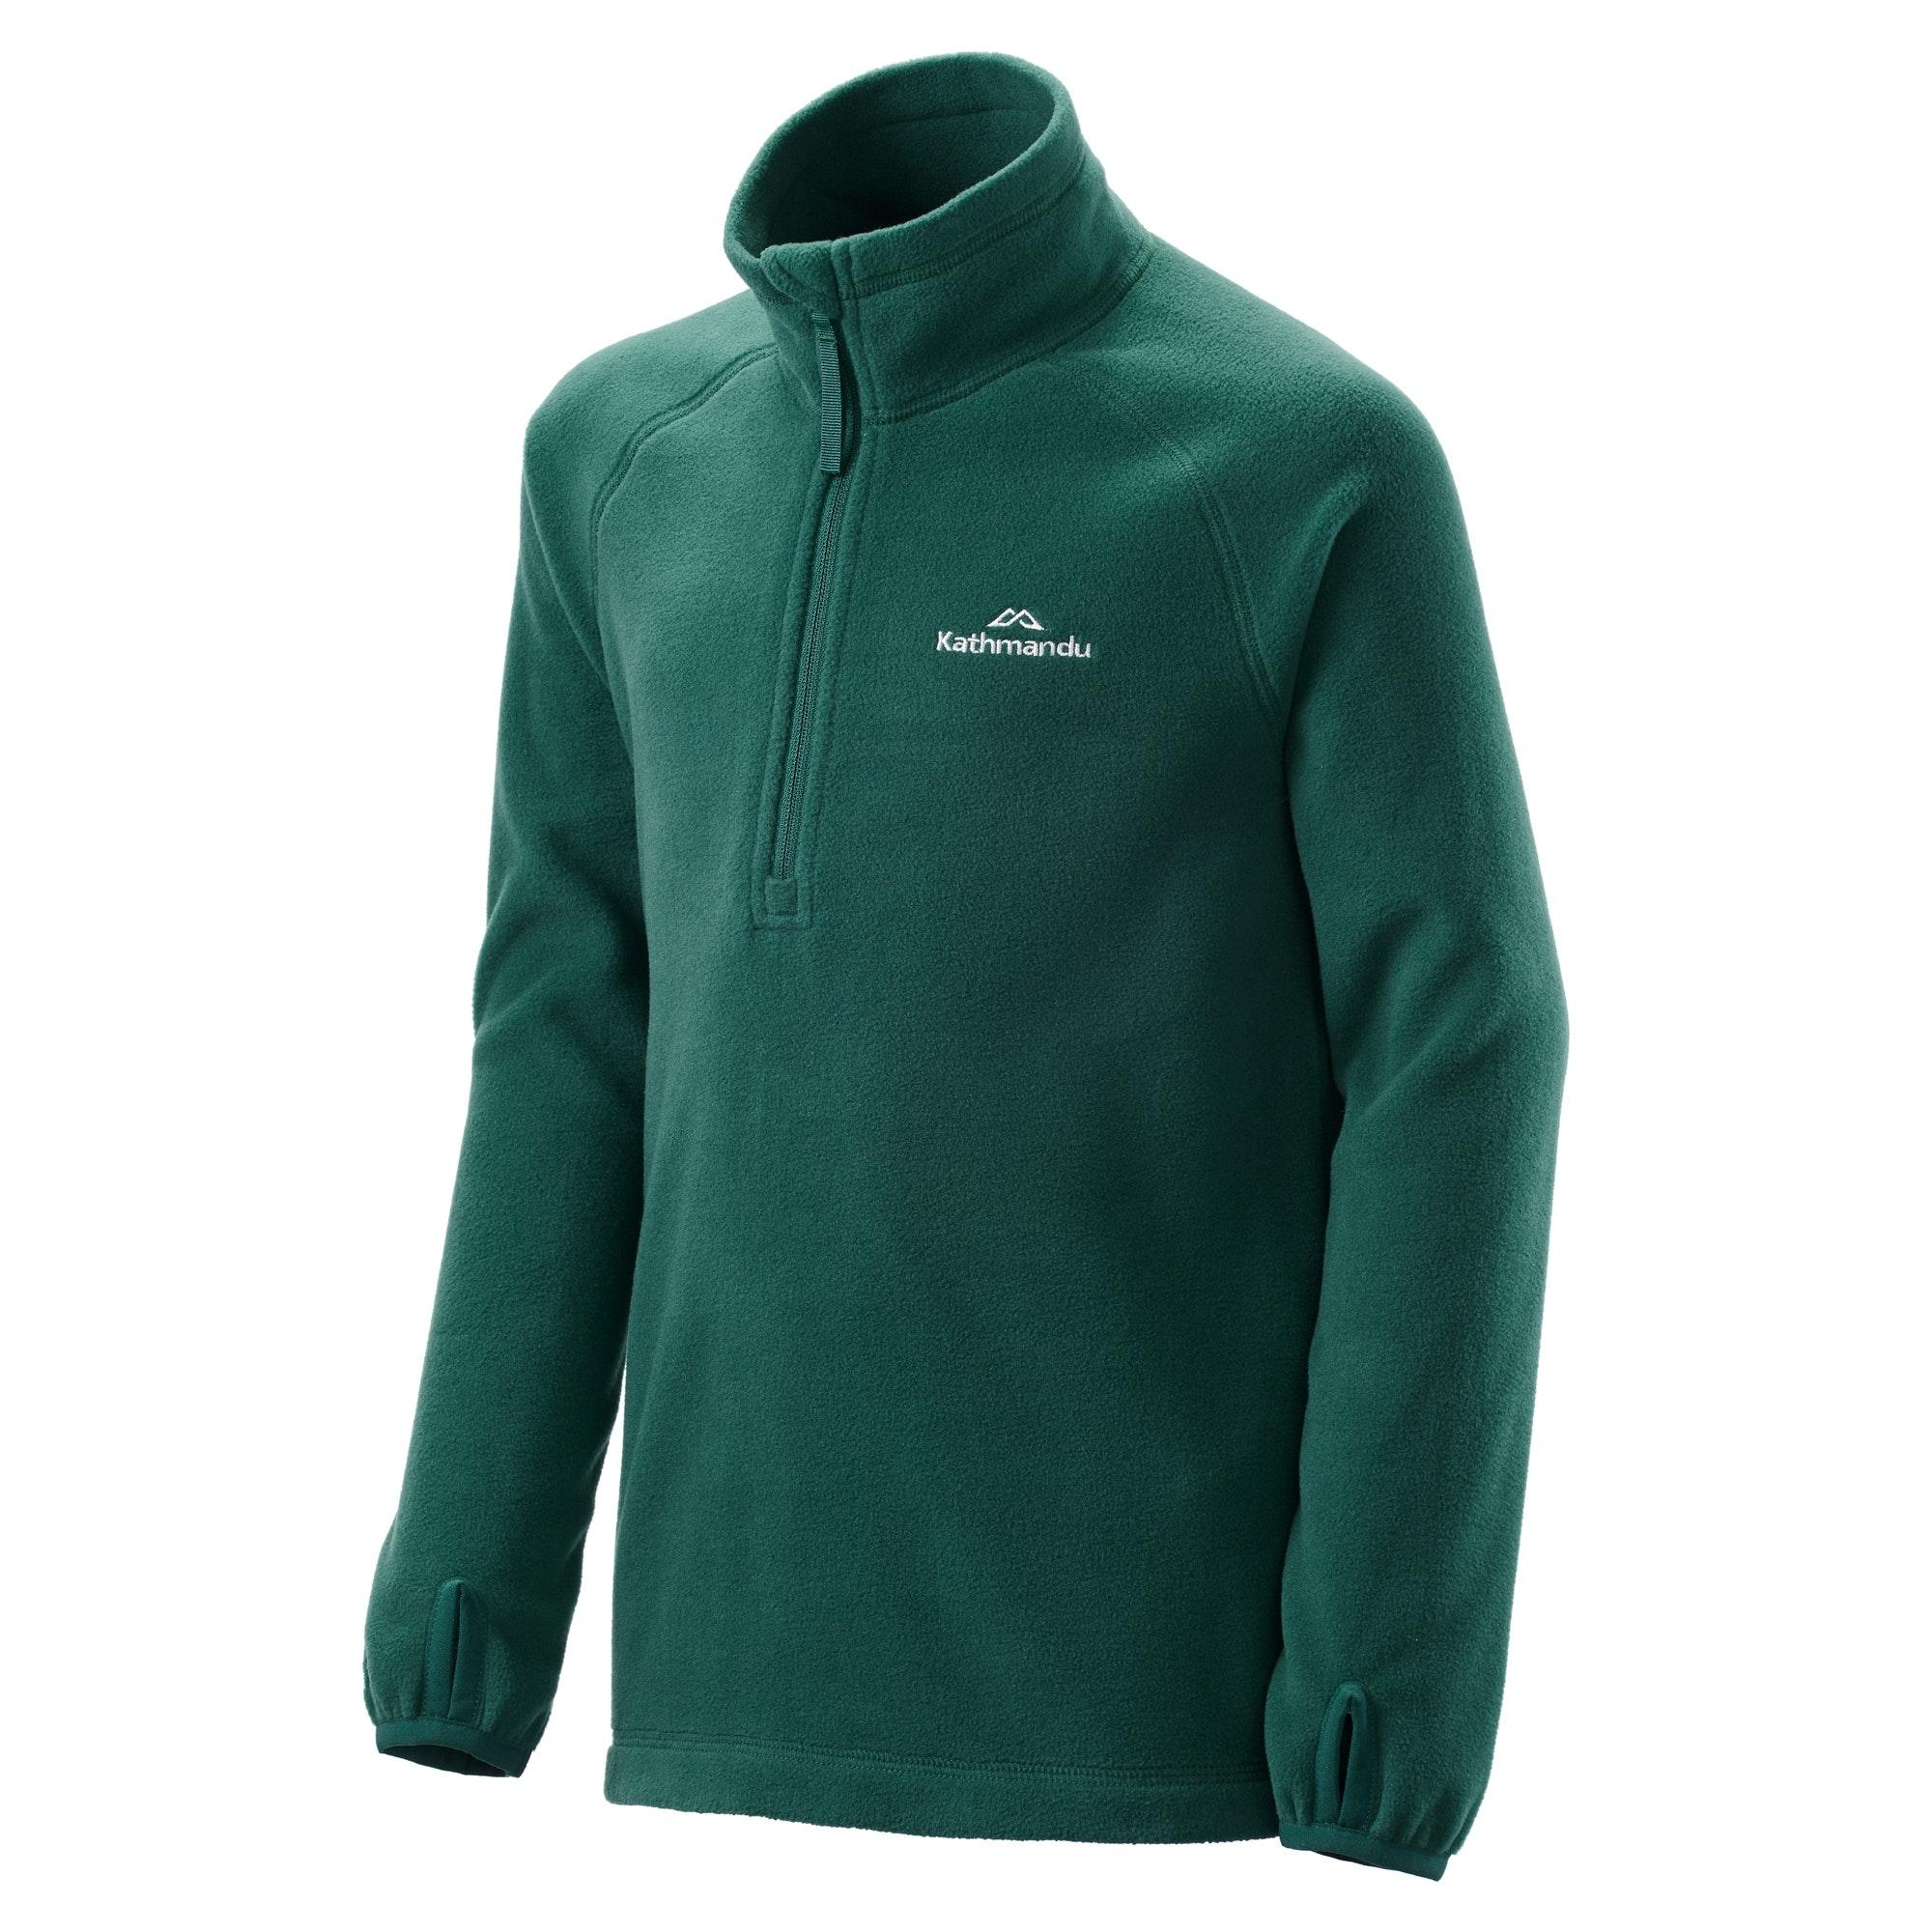 NEW-Kathmandu-Ridge-Kids-039-Girls-039-Boys-039-Warm-Fleece-Jacket-1-4-Zip-Pullover-Top thumbnail 17